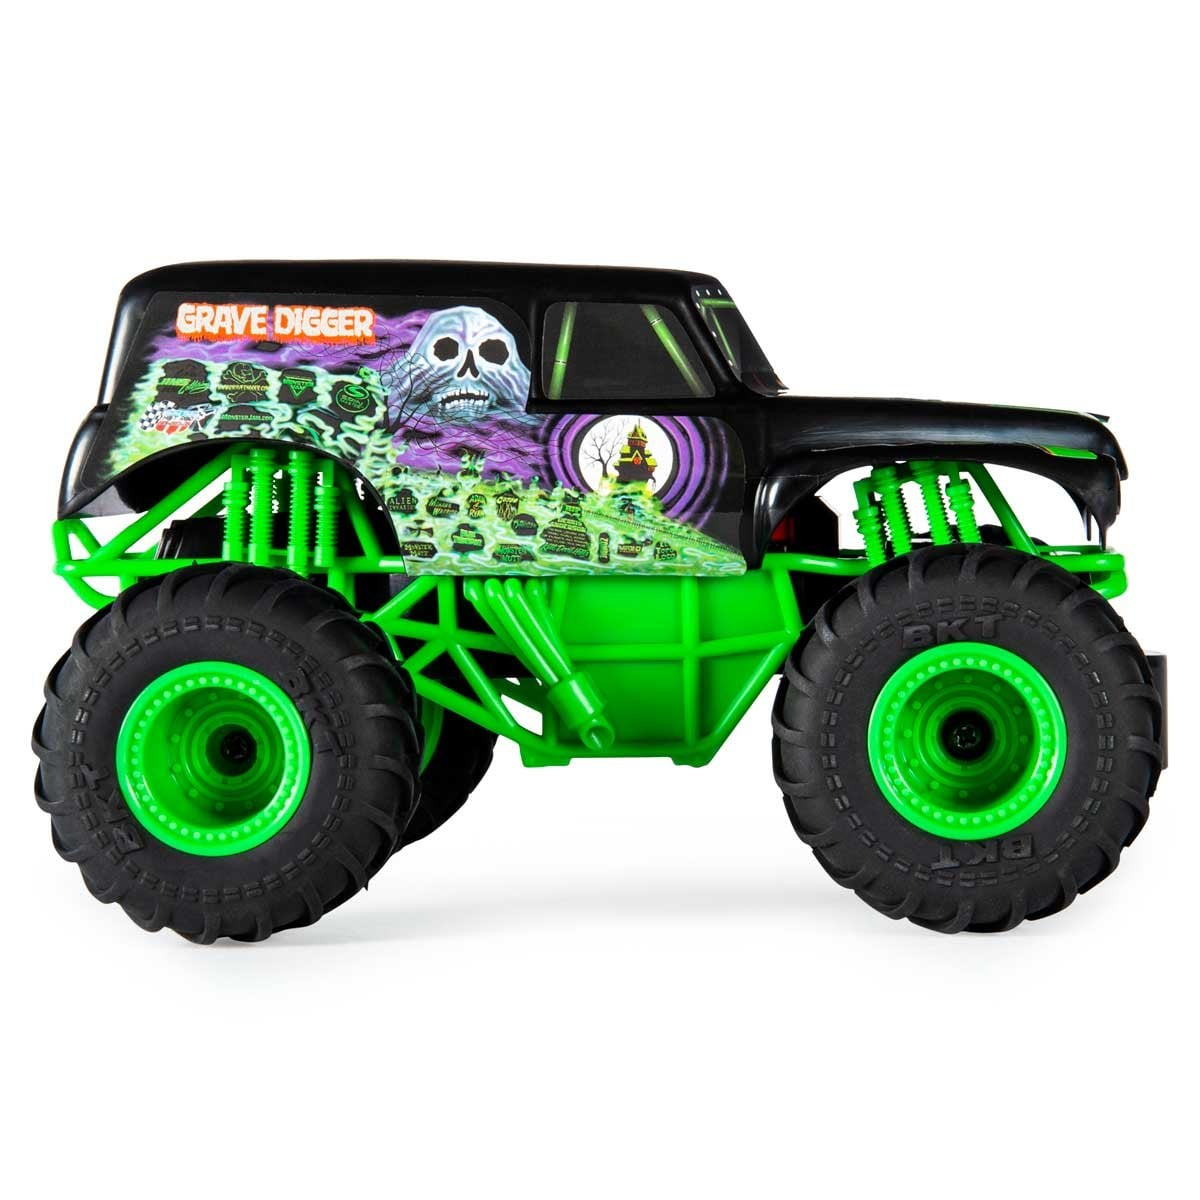 Monster Jam Rc 1:24 Grave Digger Spin Master